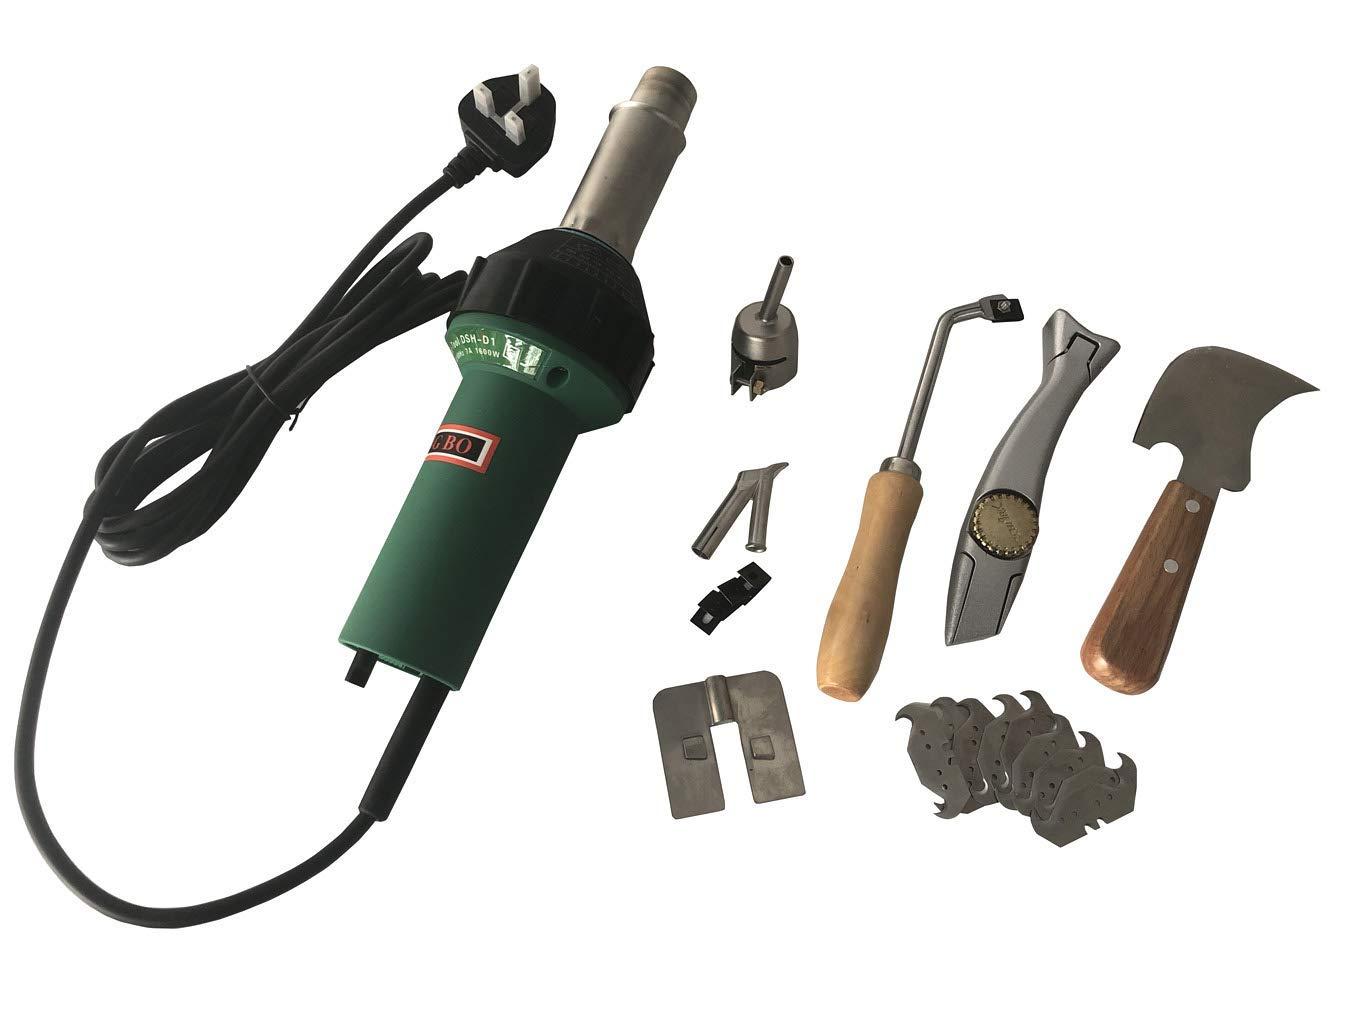 Sunwin 1600W Handheld Plastic Welder Hot Air Gun Vinyl Welding Heat Gun 2600Pa Welder Pistol Flooring Tools Flooring Welding Kit 110V